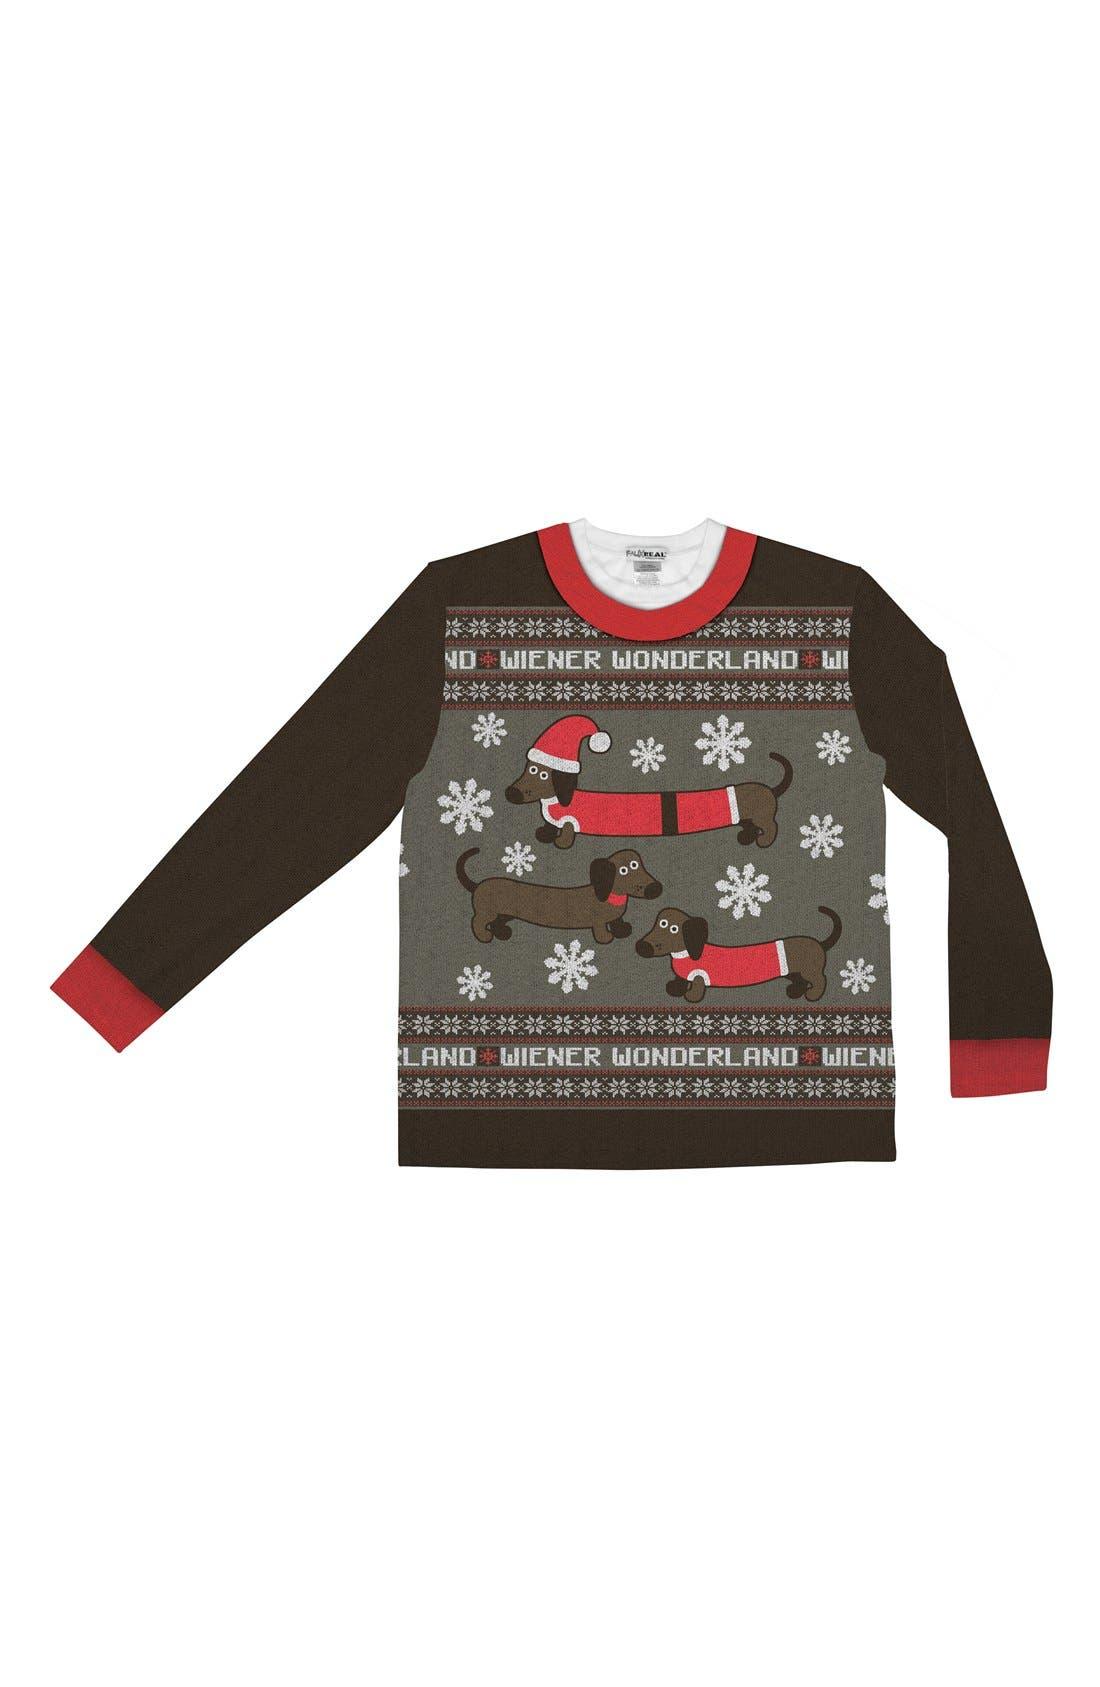 FAUX REAL,                             'Wiener Wonderland' Ugly Christmas Long Sleeve Novelty T-Shirt,                             Alternate thumbnail 3, color,                             200